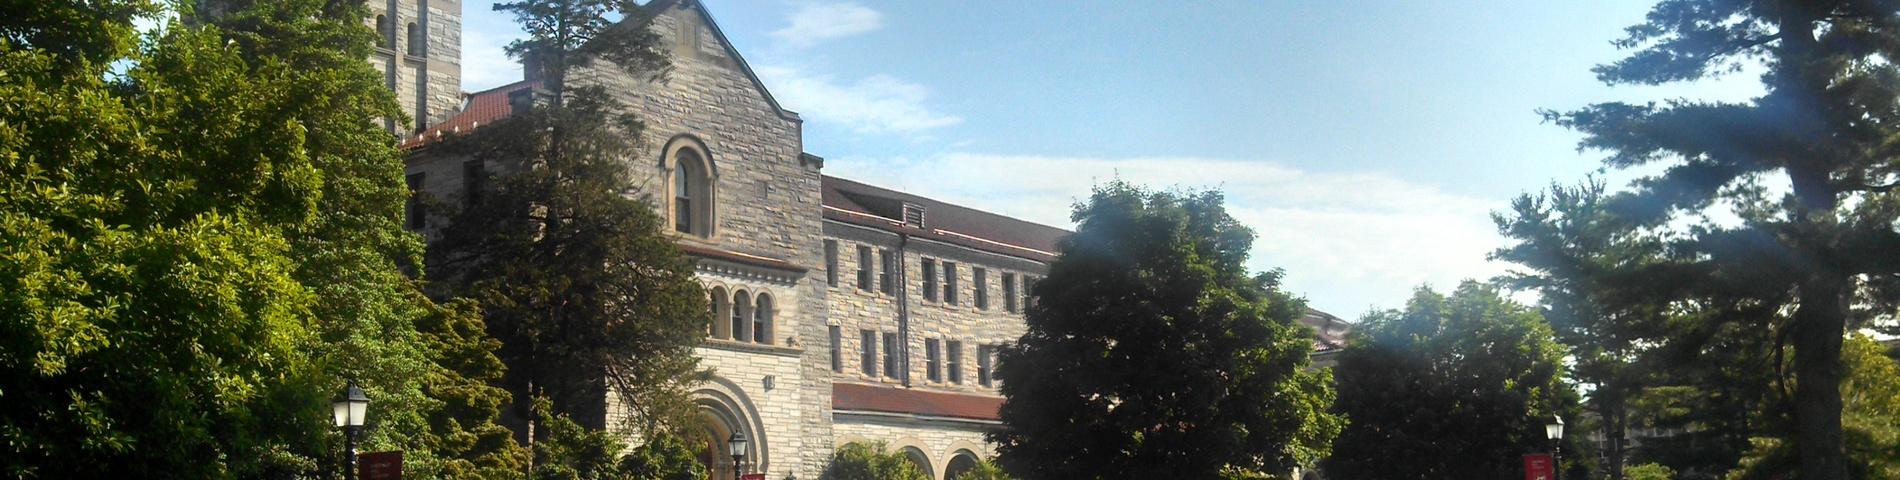 FLS - Chesnut Hill College immagine 1